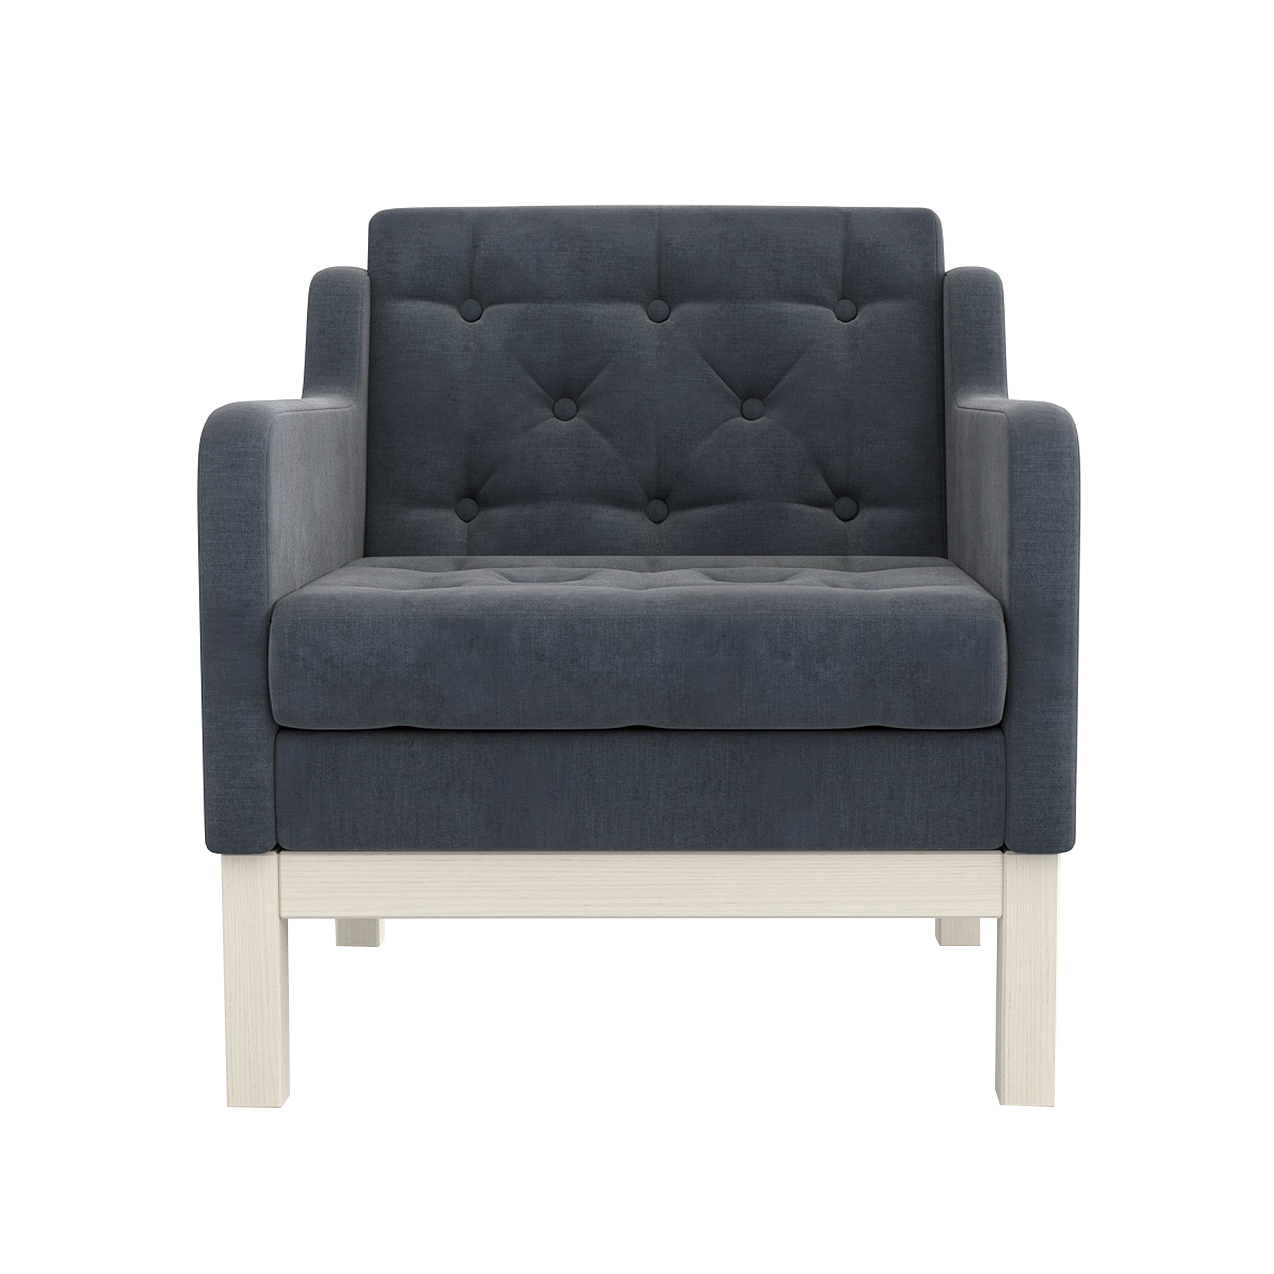 Фото - Кресло AS Алана 75.5x82x83 беленый дуб/серый диван as алана м 154x82x83 беленый дуб белый